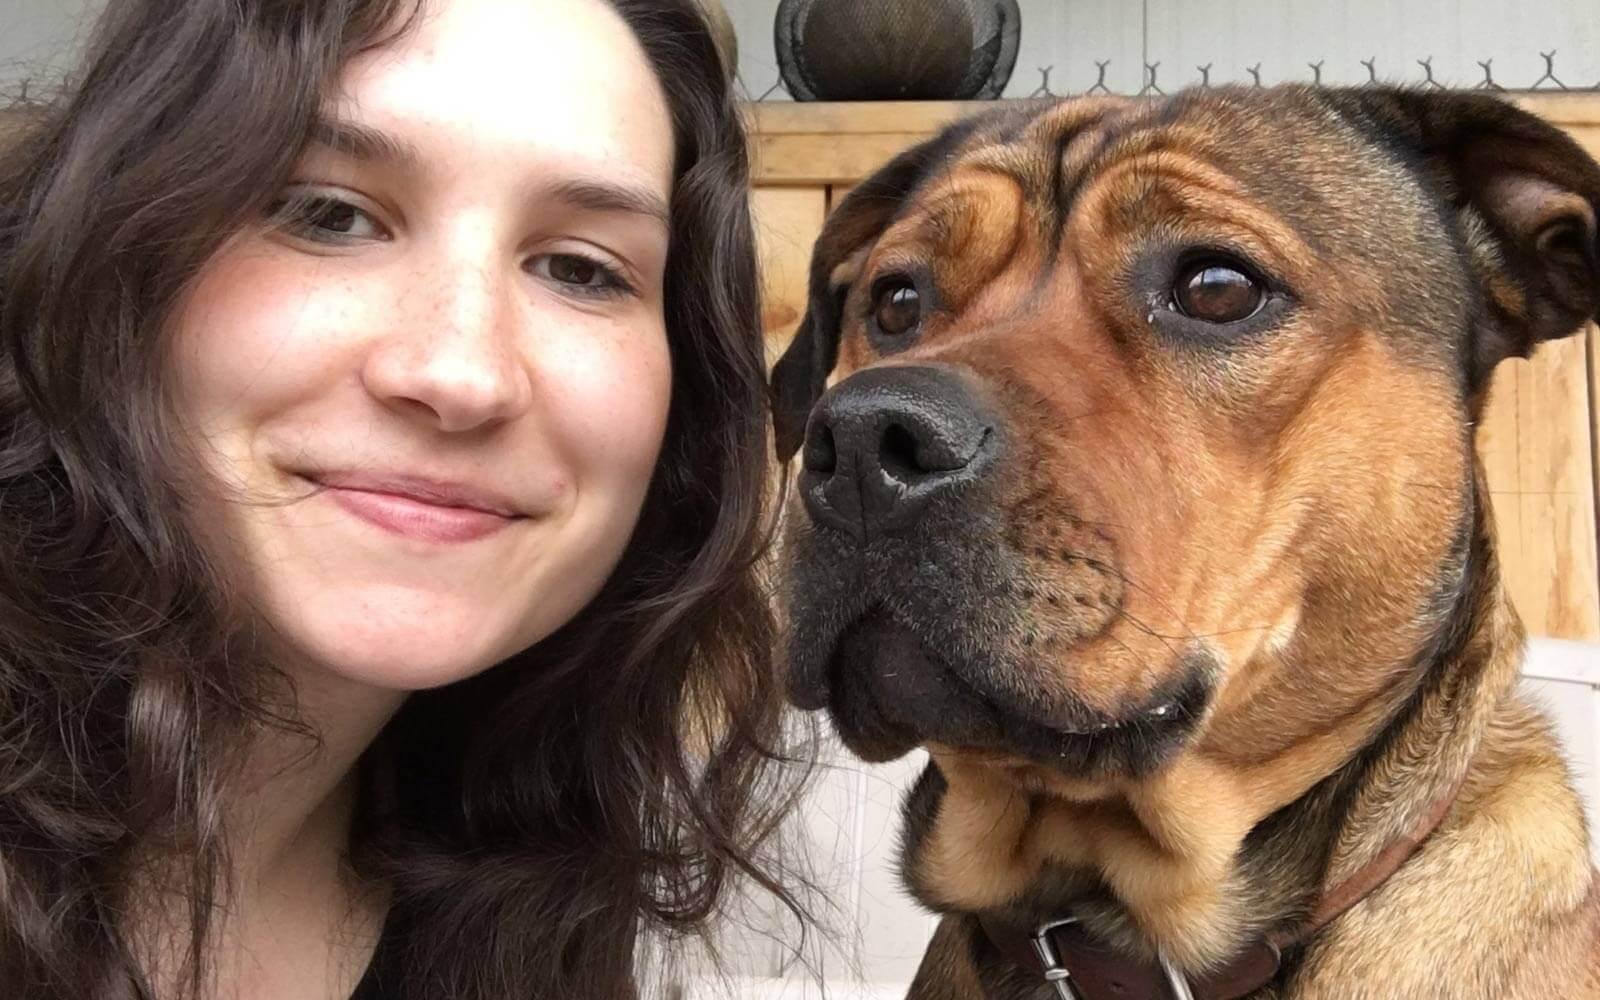 Desiree-mit-Hund-Raja-im-Tierschutzprojekt